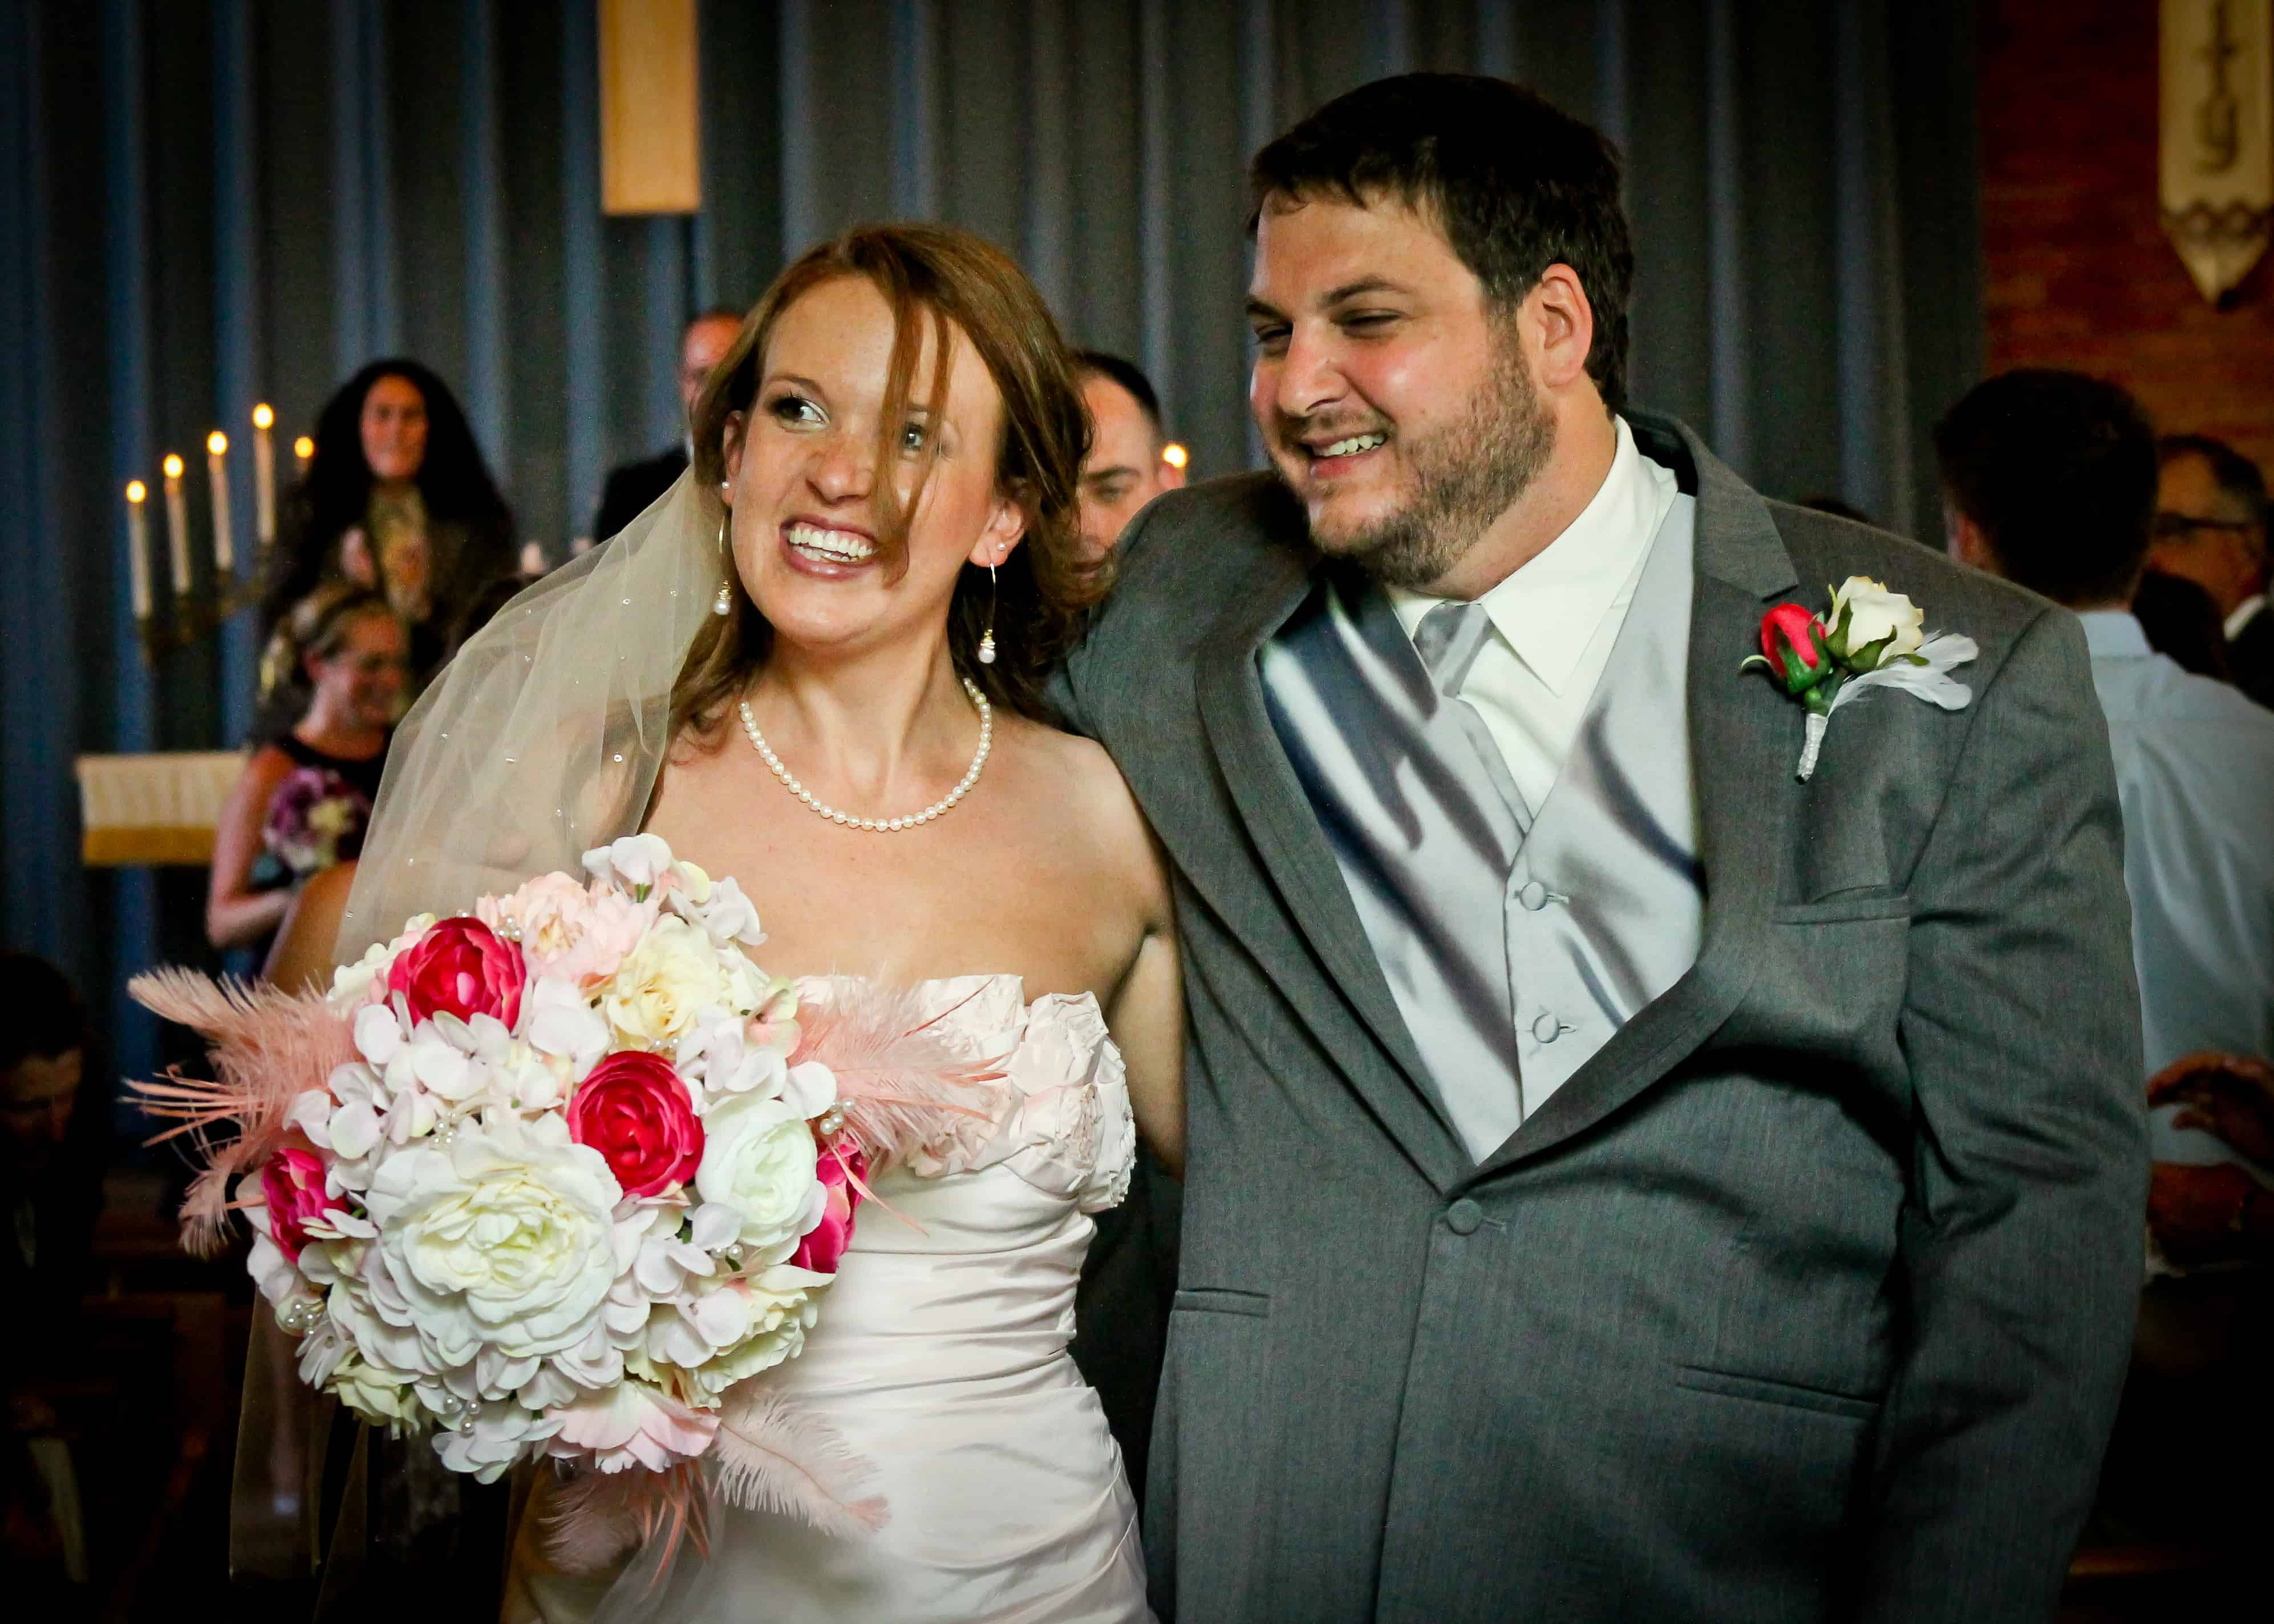 Paice Wedding   Wedding Photography   Create & Capture